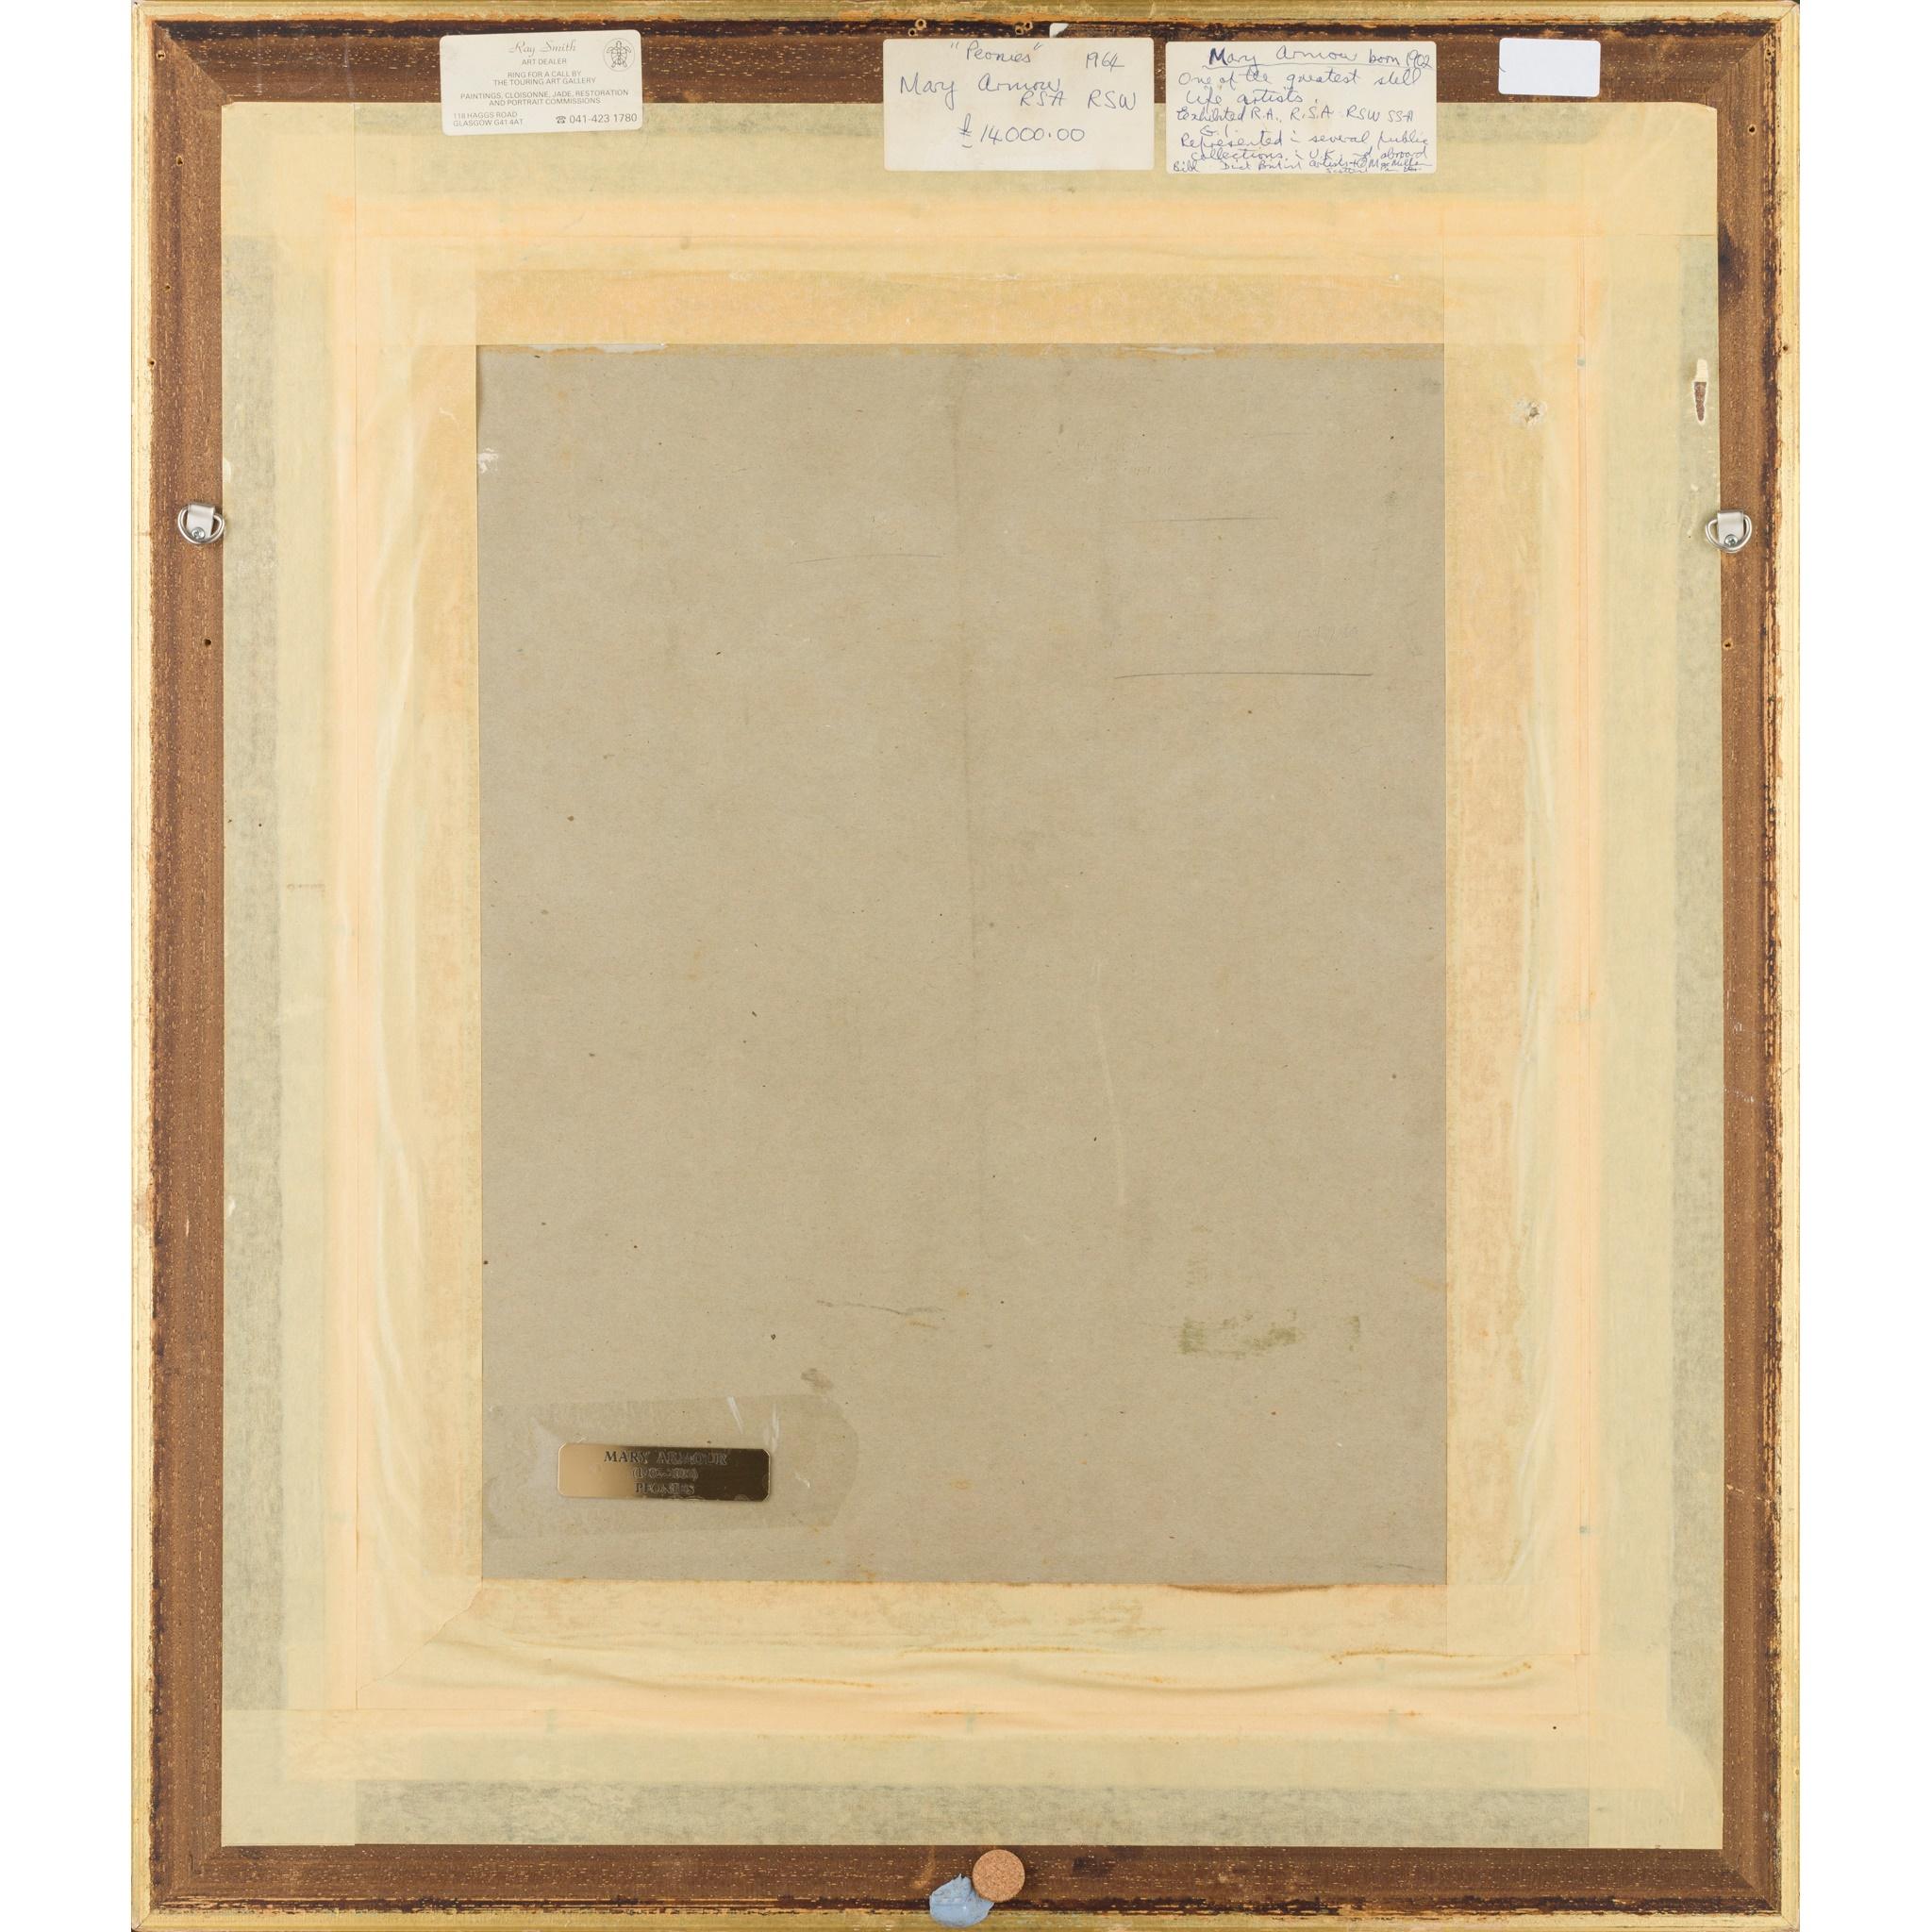 § MARY NICOL NEILL ARMOUR R.S.A., R.S.W. (SCOTTISH 1902-2000) PEONIES - Image 3 of 3